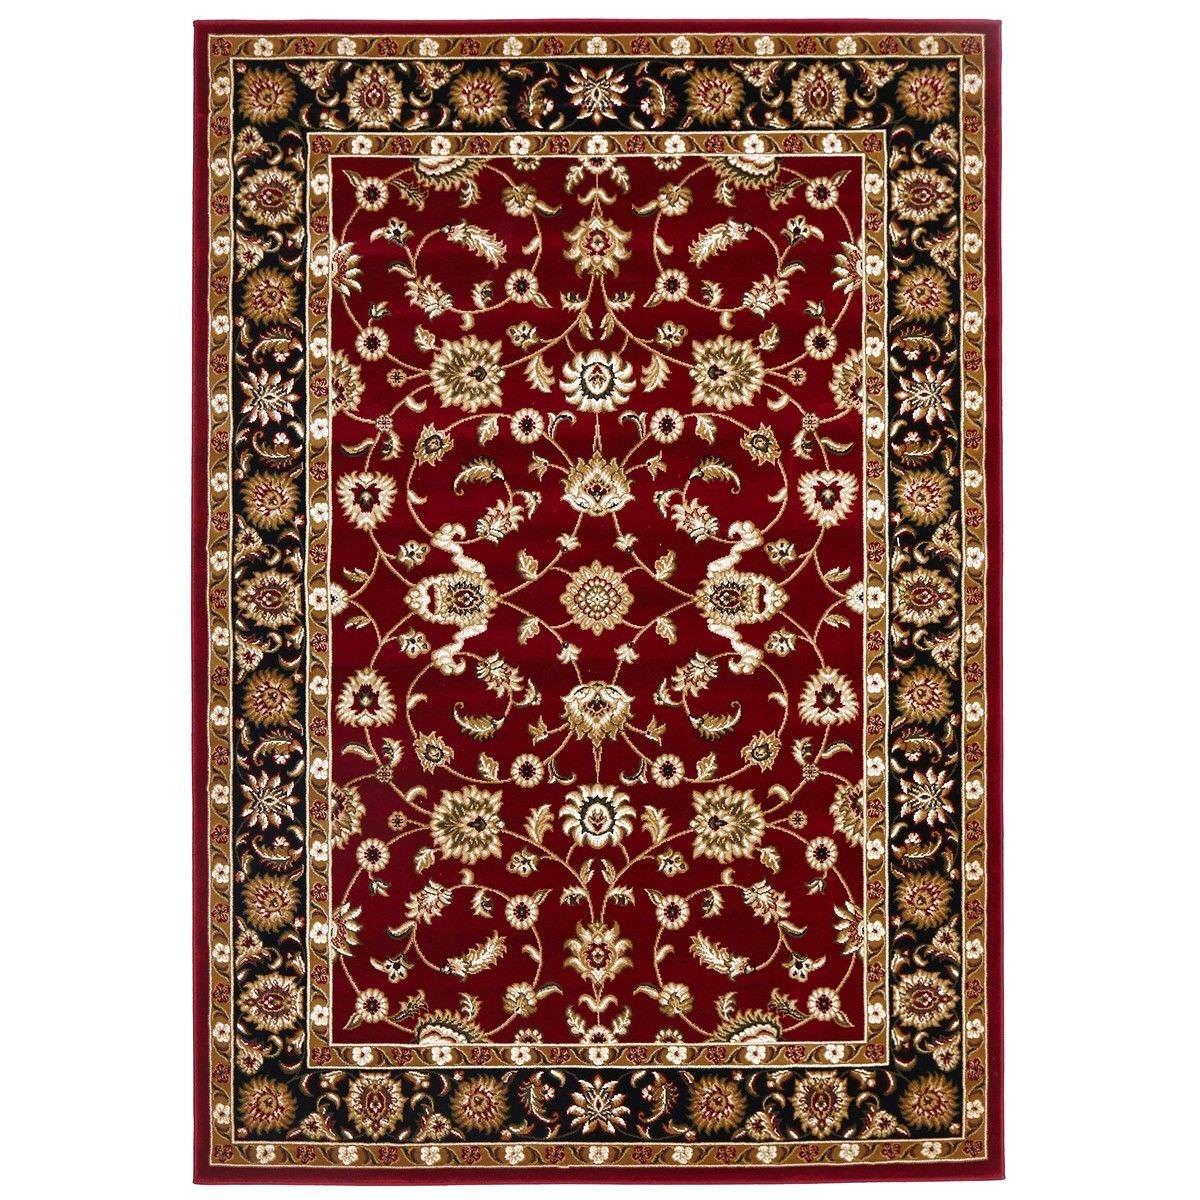 Turkish Rug Au: Sydney Classic Turkish Made Oriental Rug, 150x80cm, Red